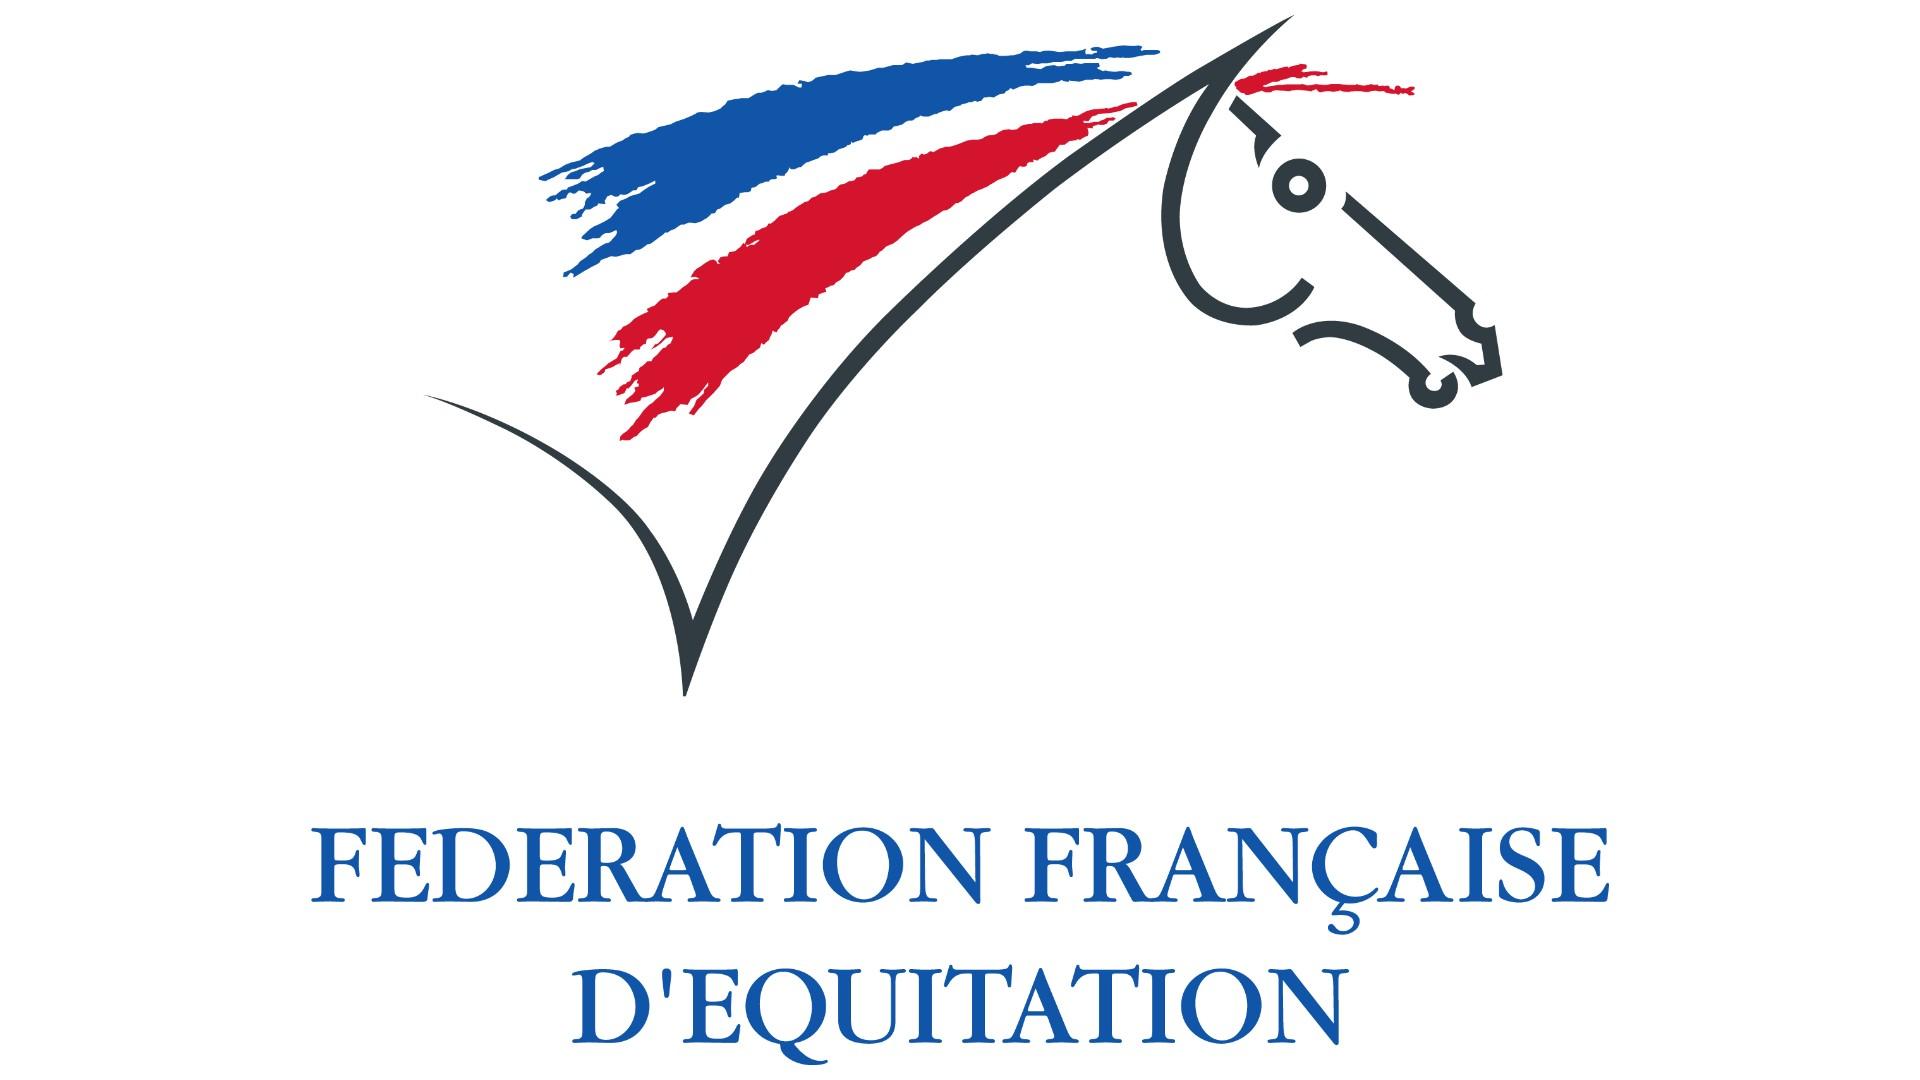 Fédération française d'équitation FFE (2) Logo